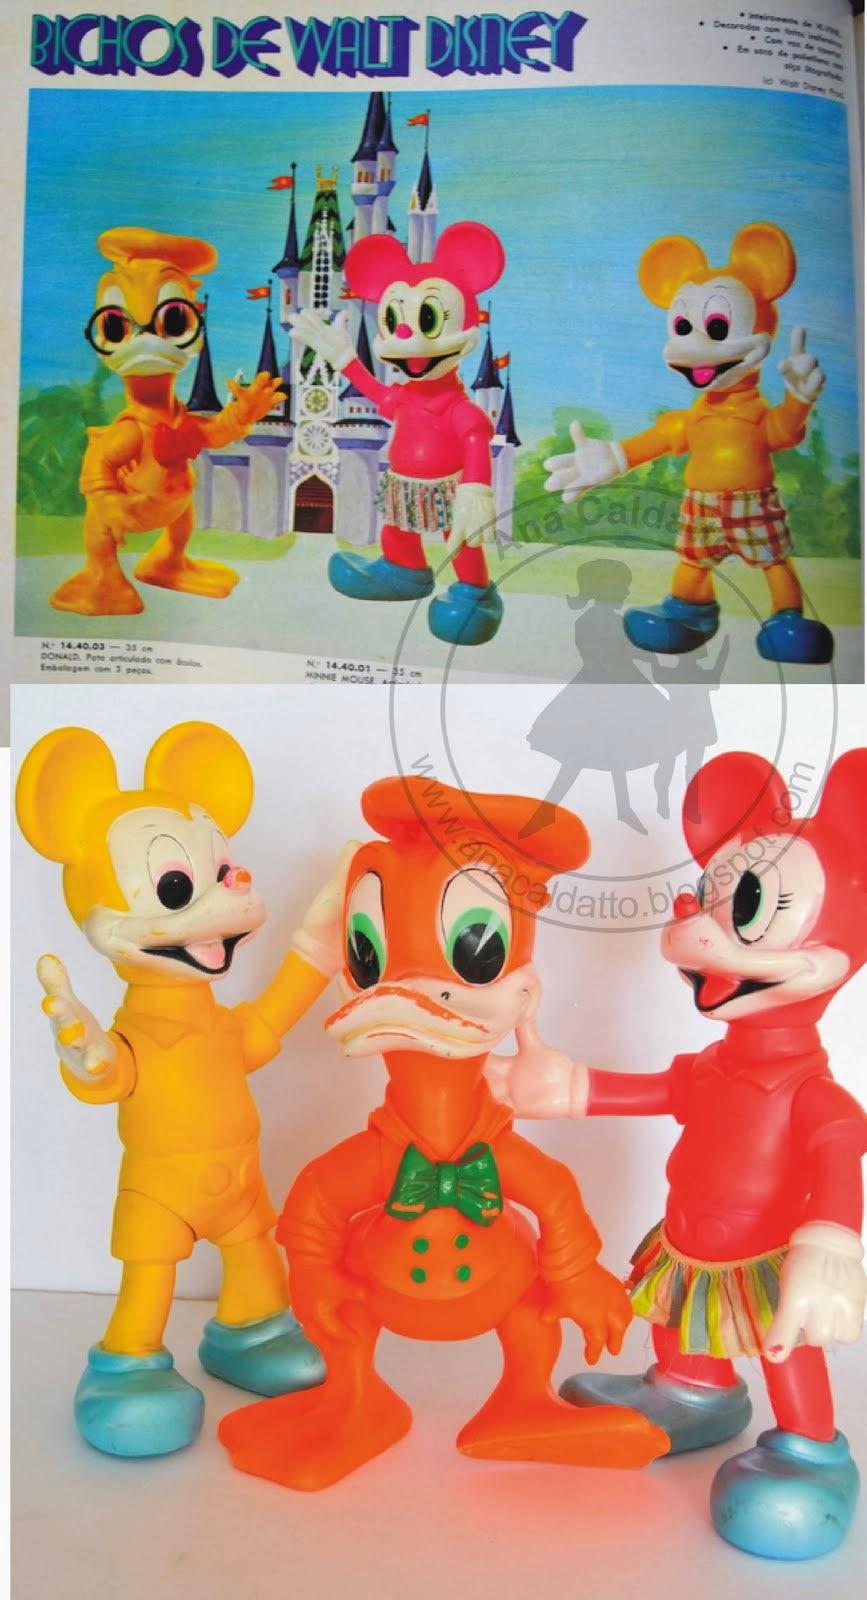 Bichos de Walt Disney